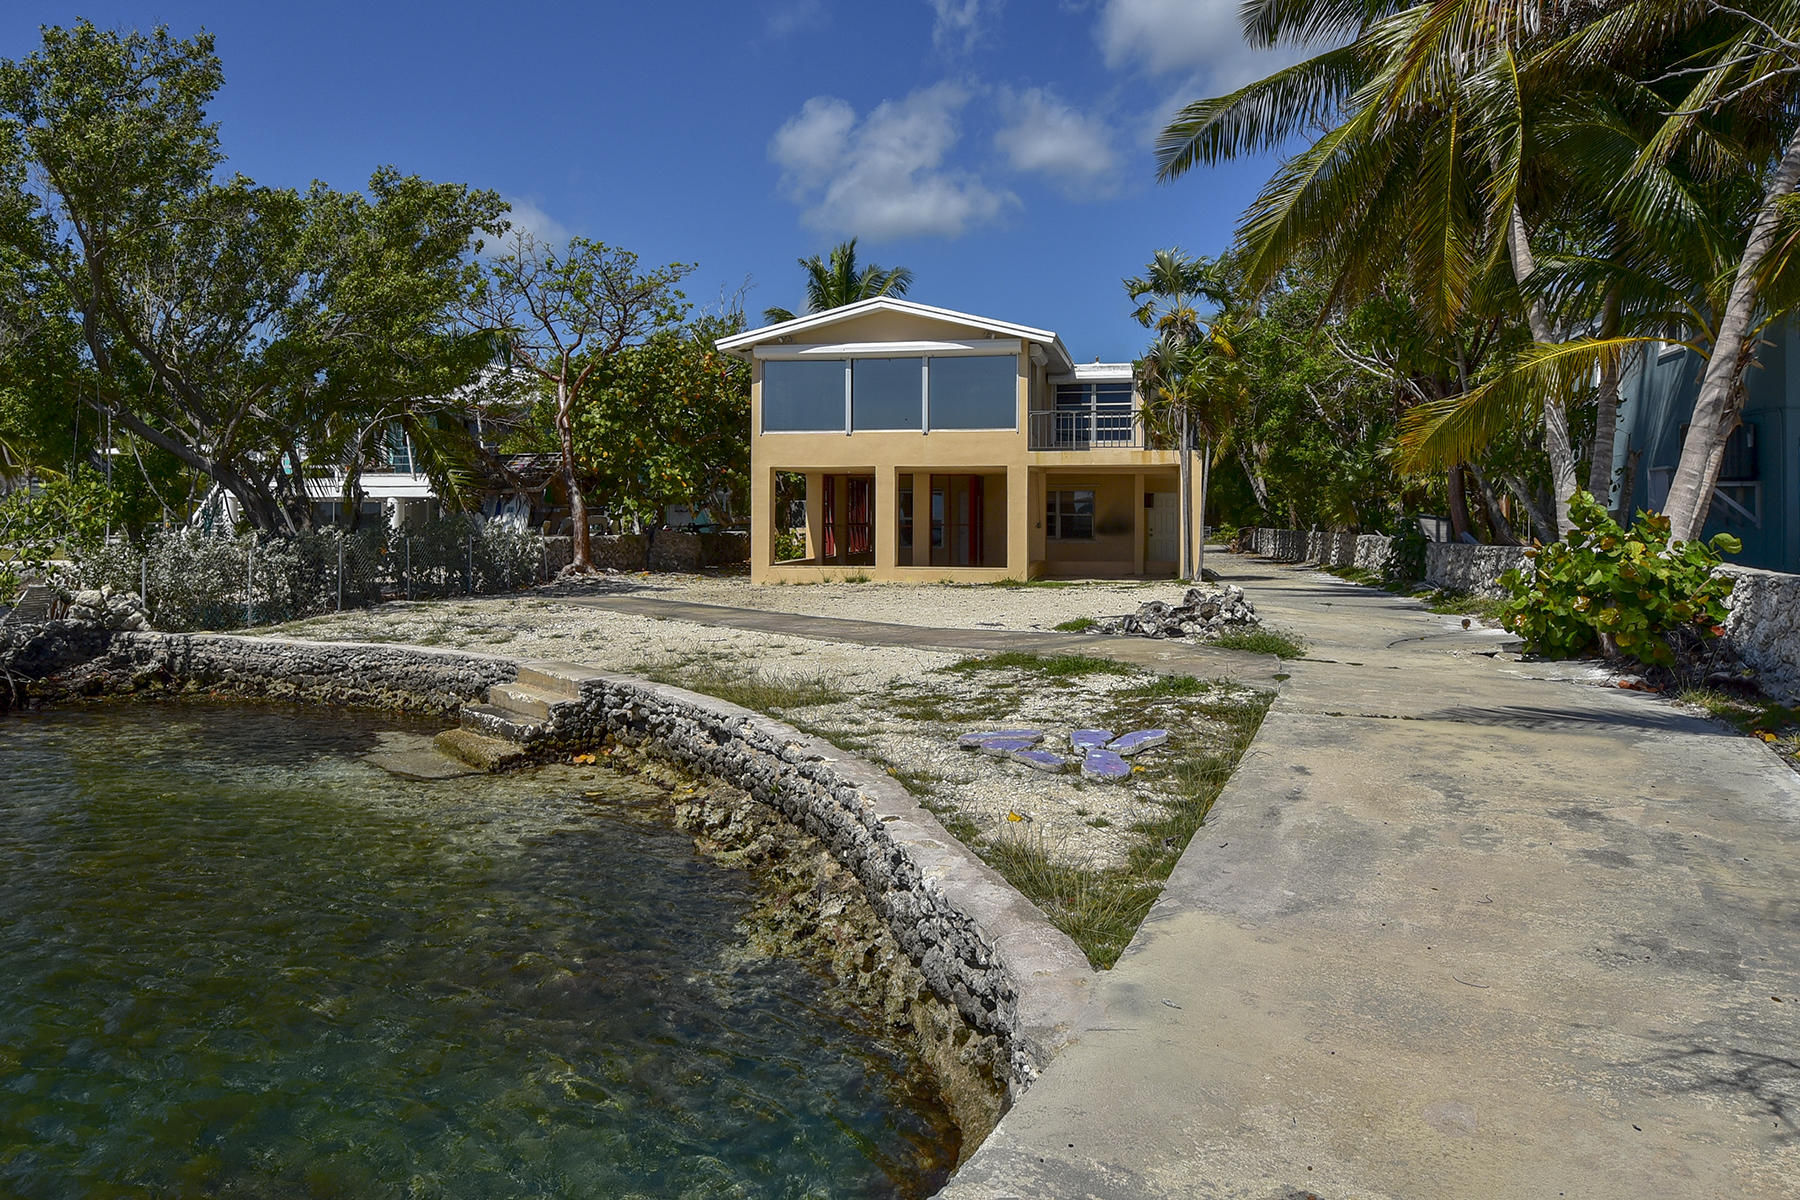 Property for Sale at 77 Shoreland Drive, Key Largo, FL 77 Shoreland Drive Key Largo, Florida 33037 United States